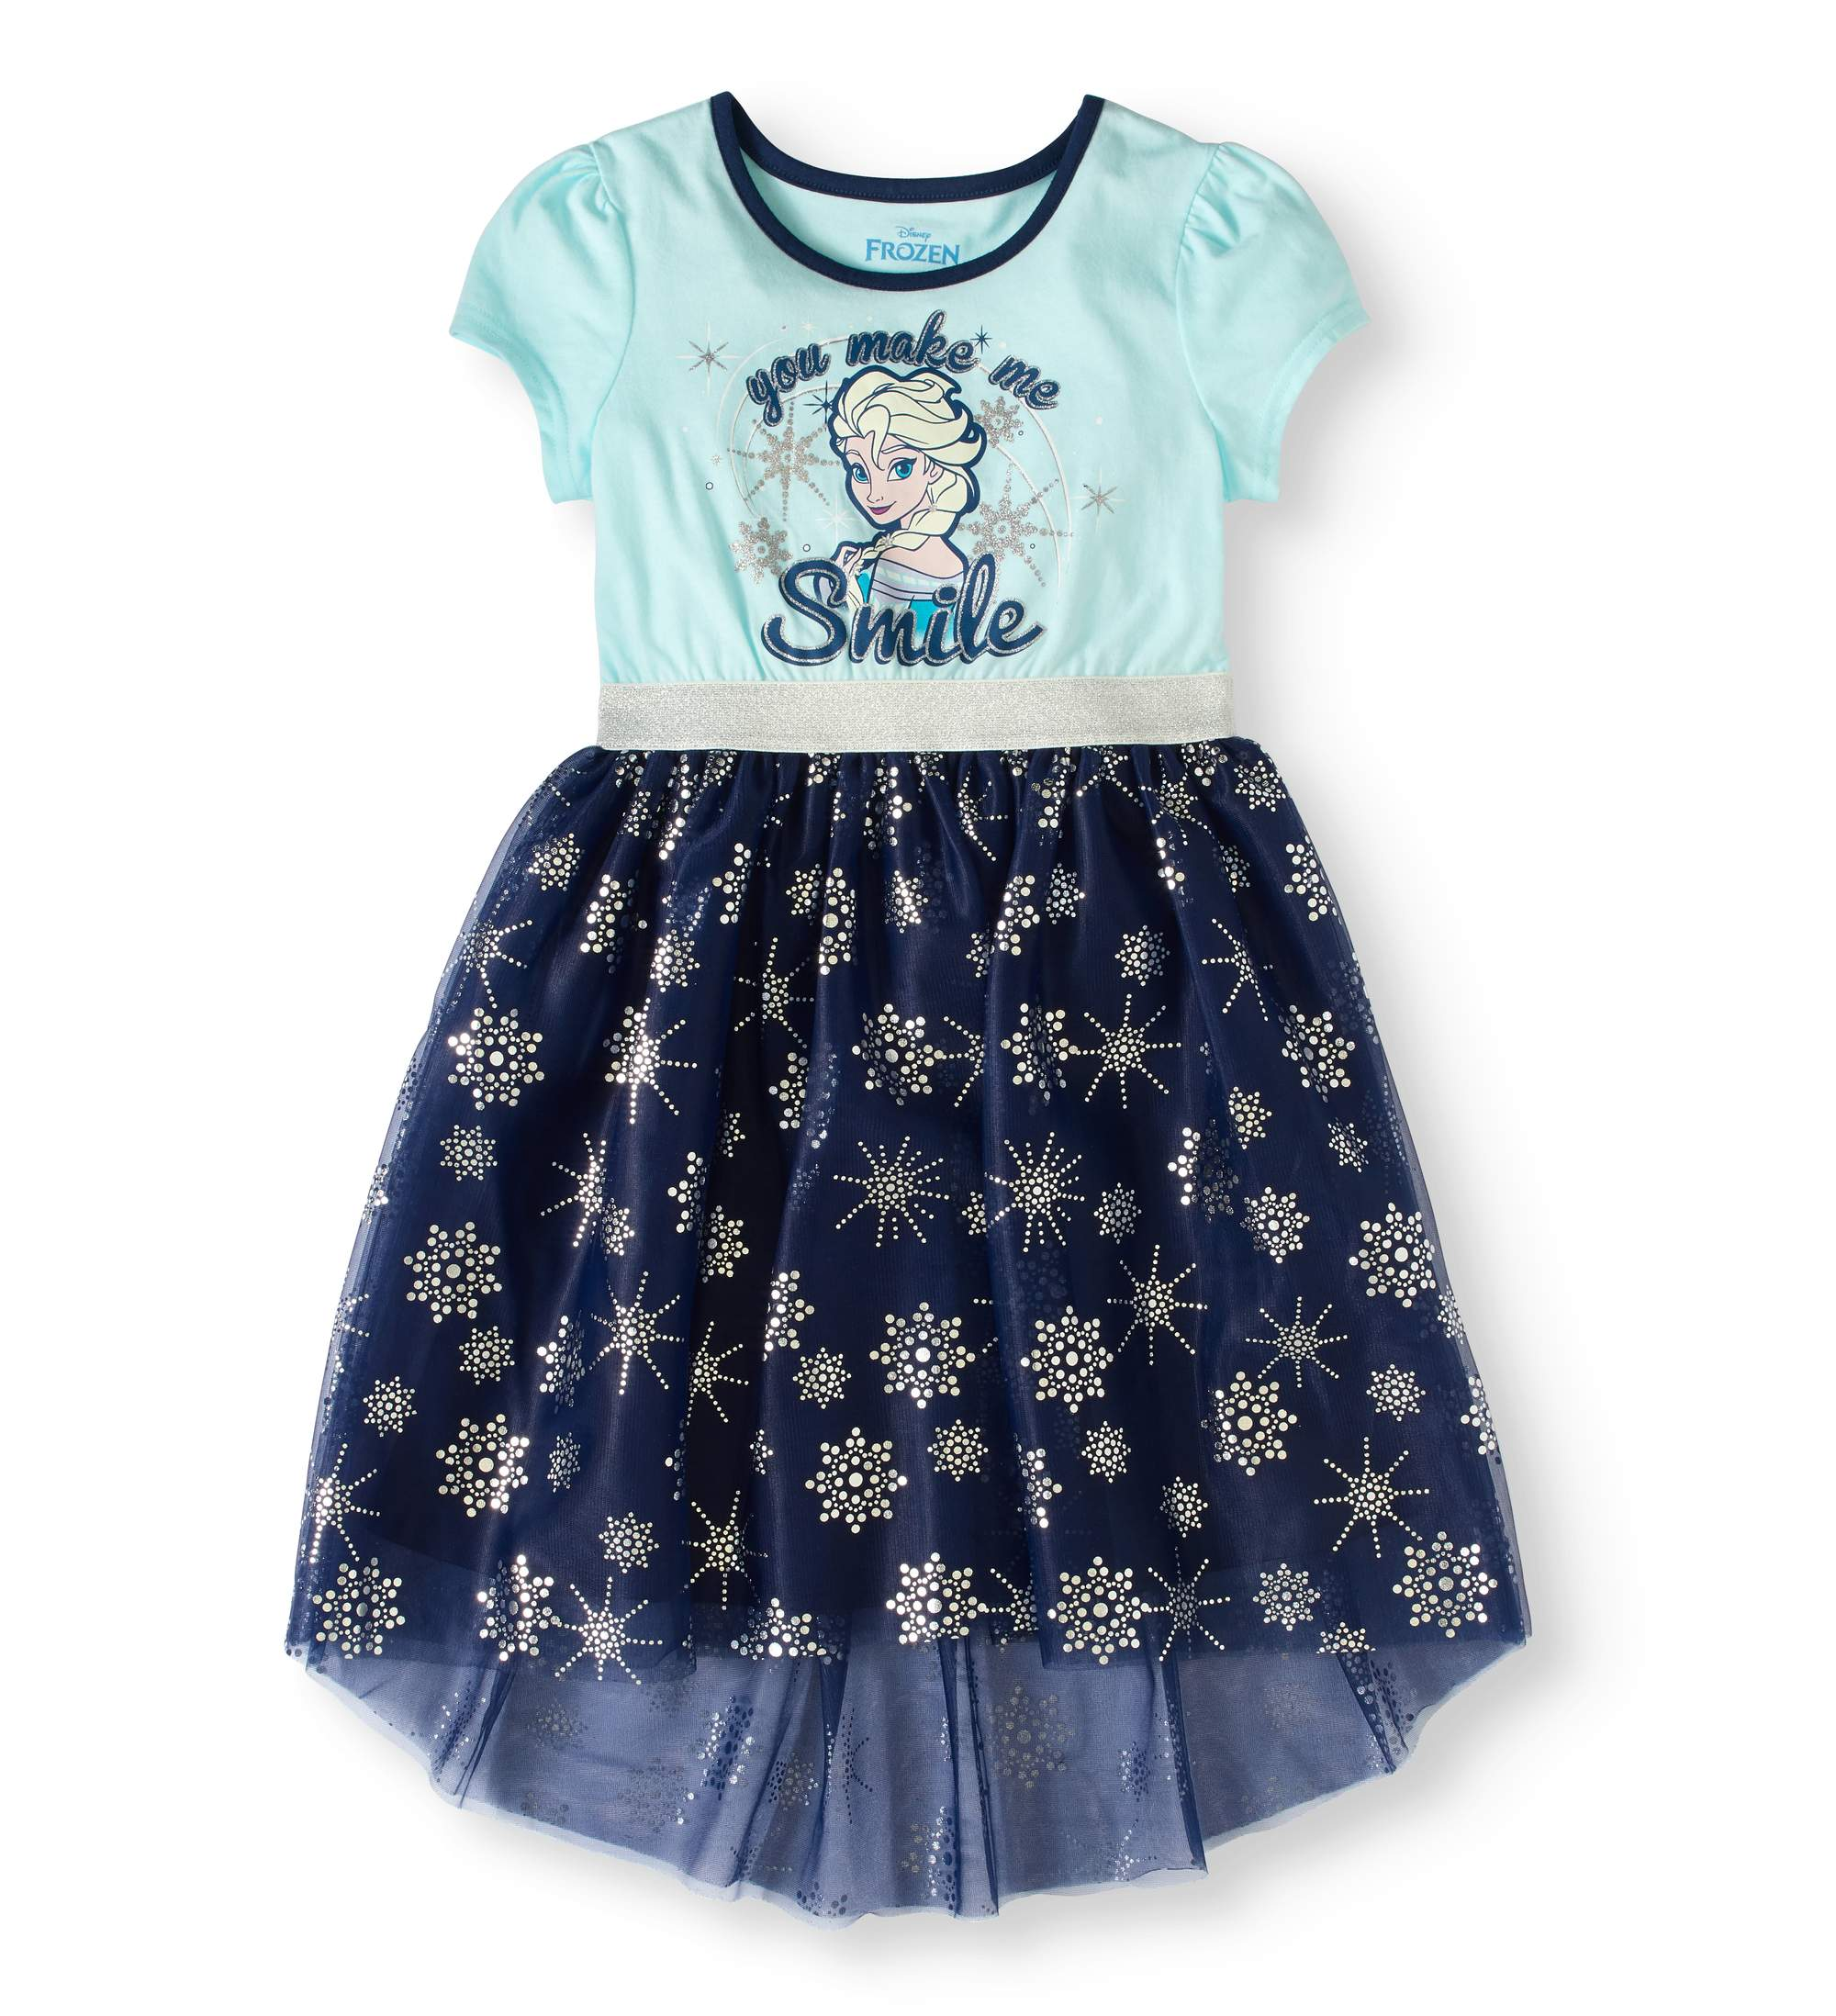 Disney Frozen Girls' Elsa Glitter Graphic Short Sleeve Dress with Foil Print Mesh